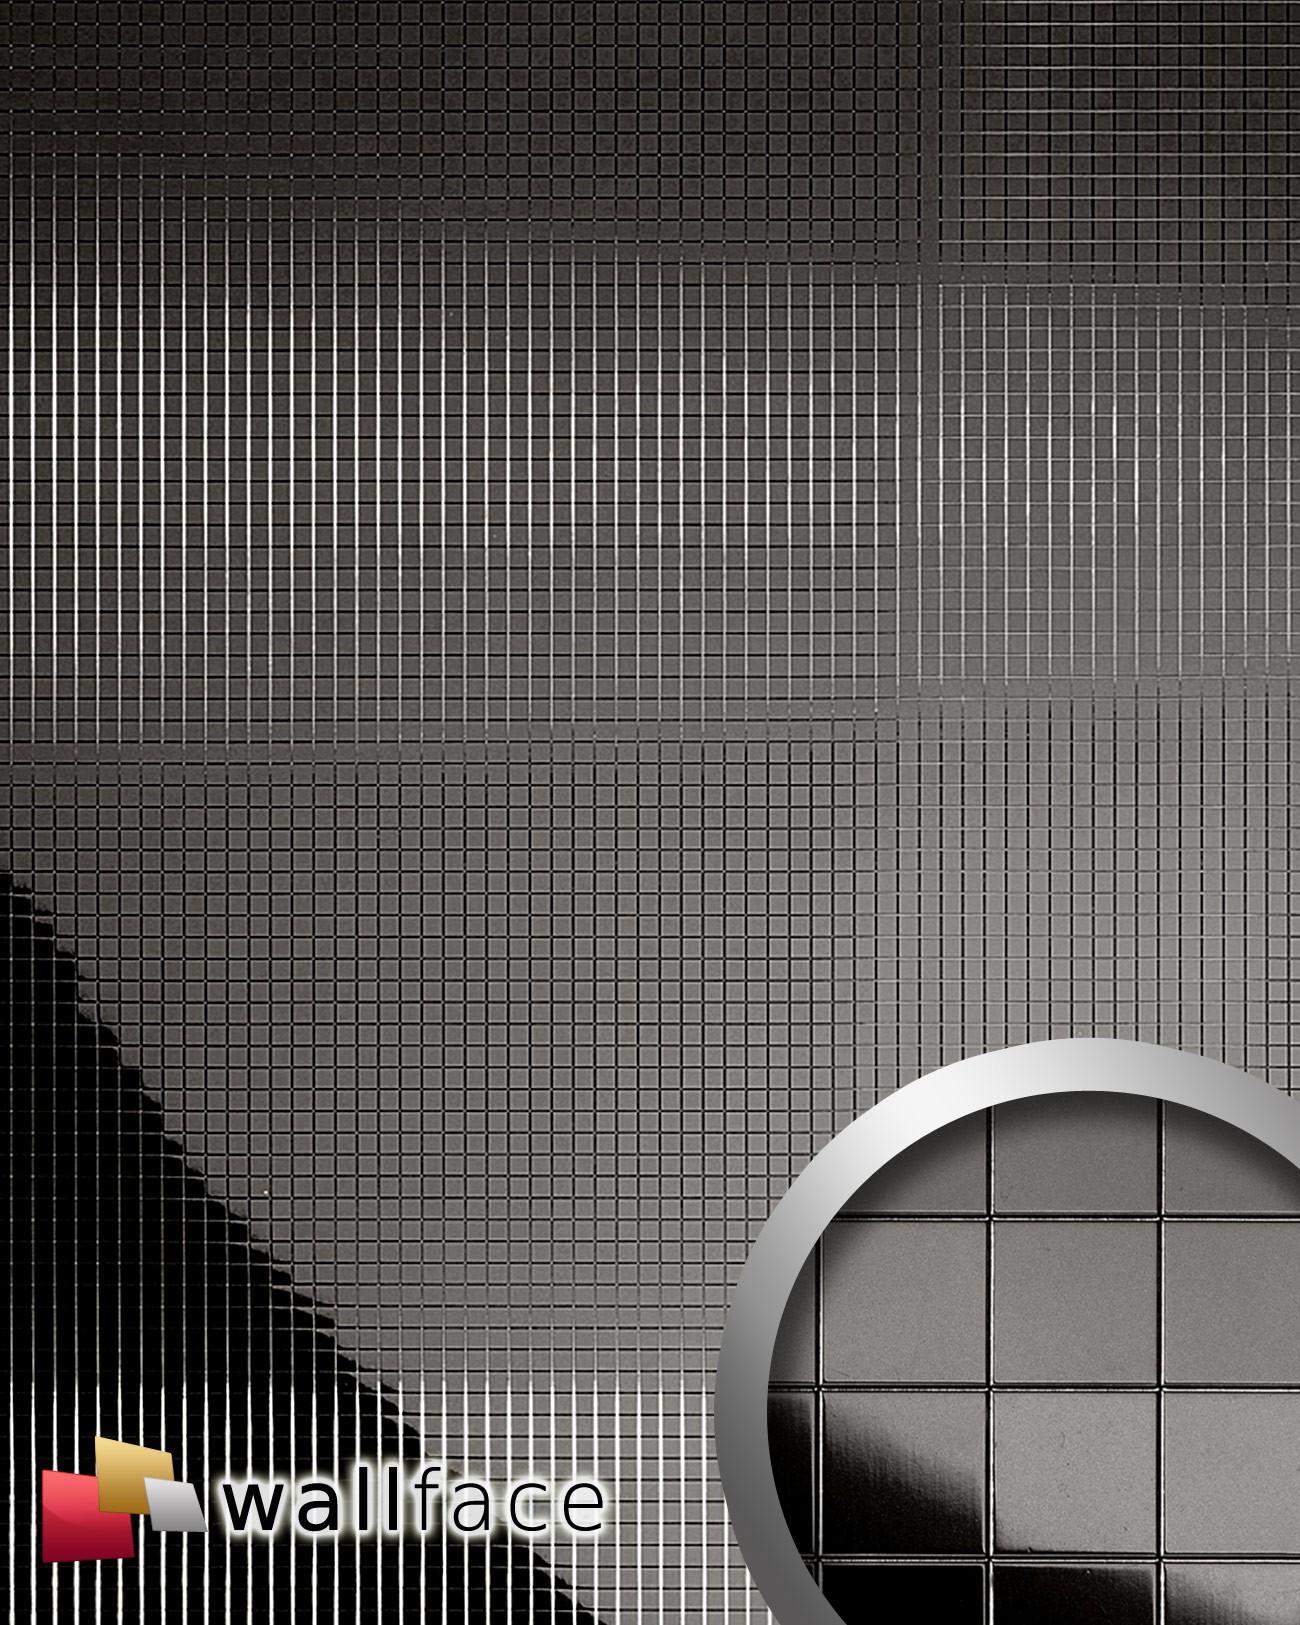 Panou Decorativ M-style 10533  Wallface  Autocolan